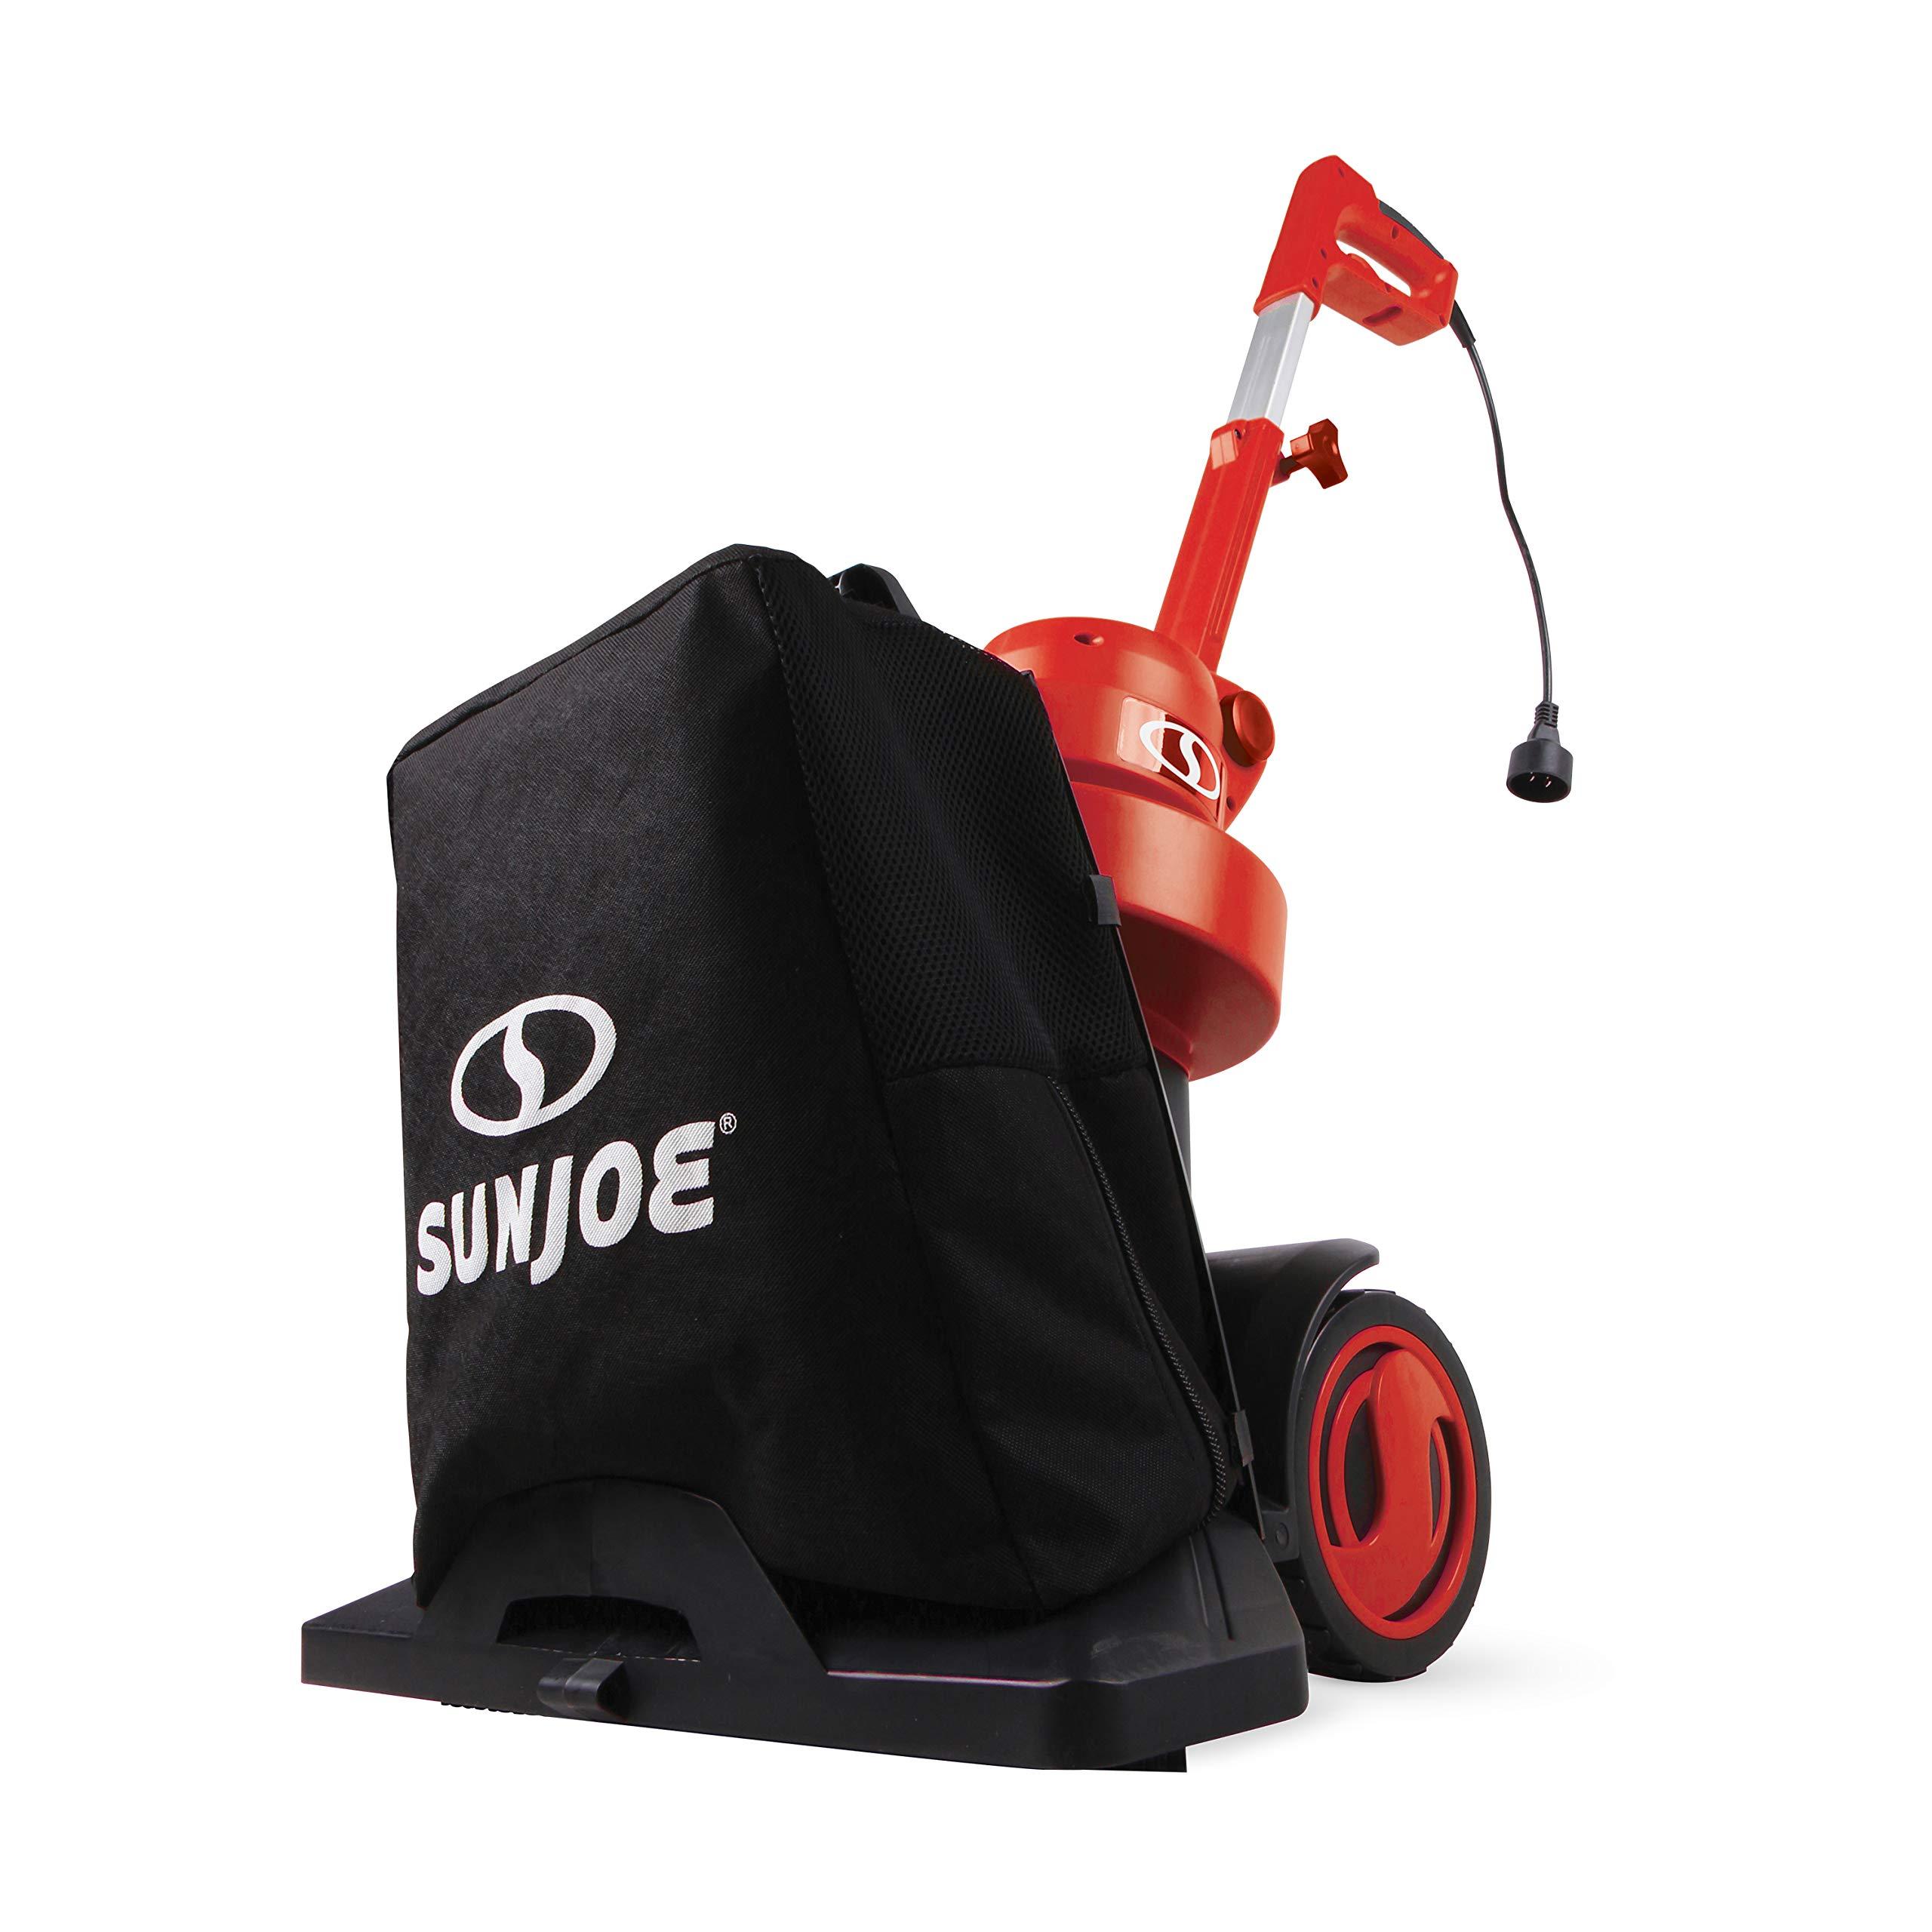 Sun Joe SBJ801E-RED-RM 3-in-1 Electric Blower/Vacuum/Mulcher   Max 130 MPH   13.5-Amp   Walk Behind (Red,Refurbished)